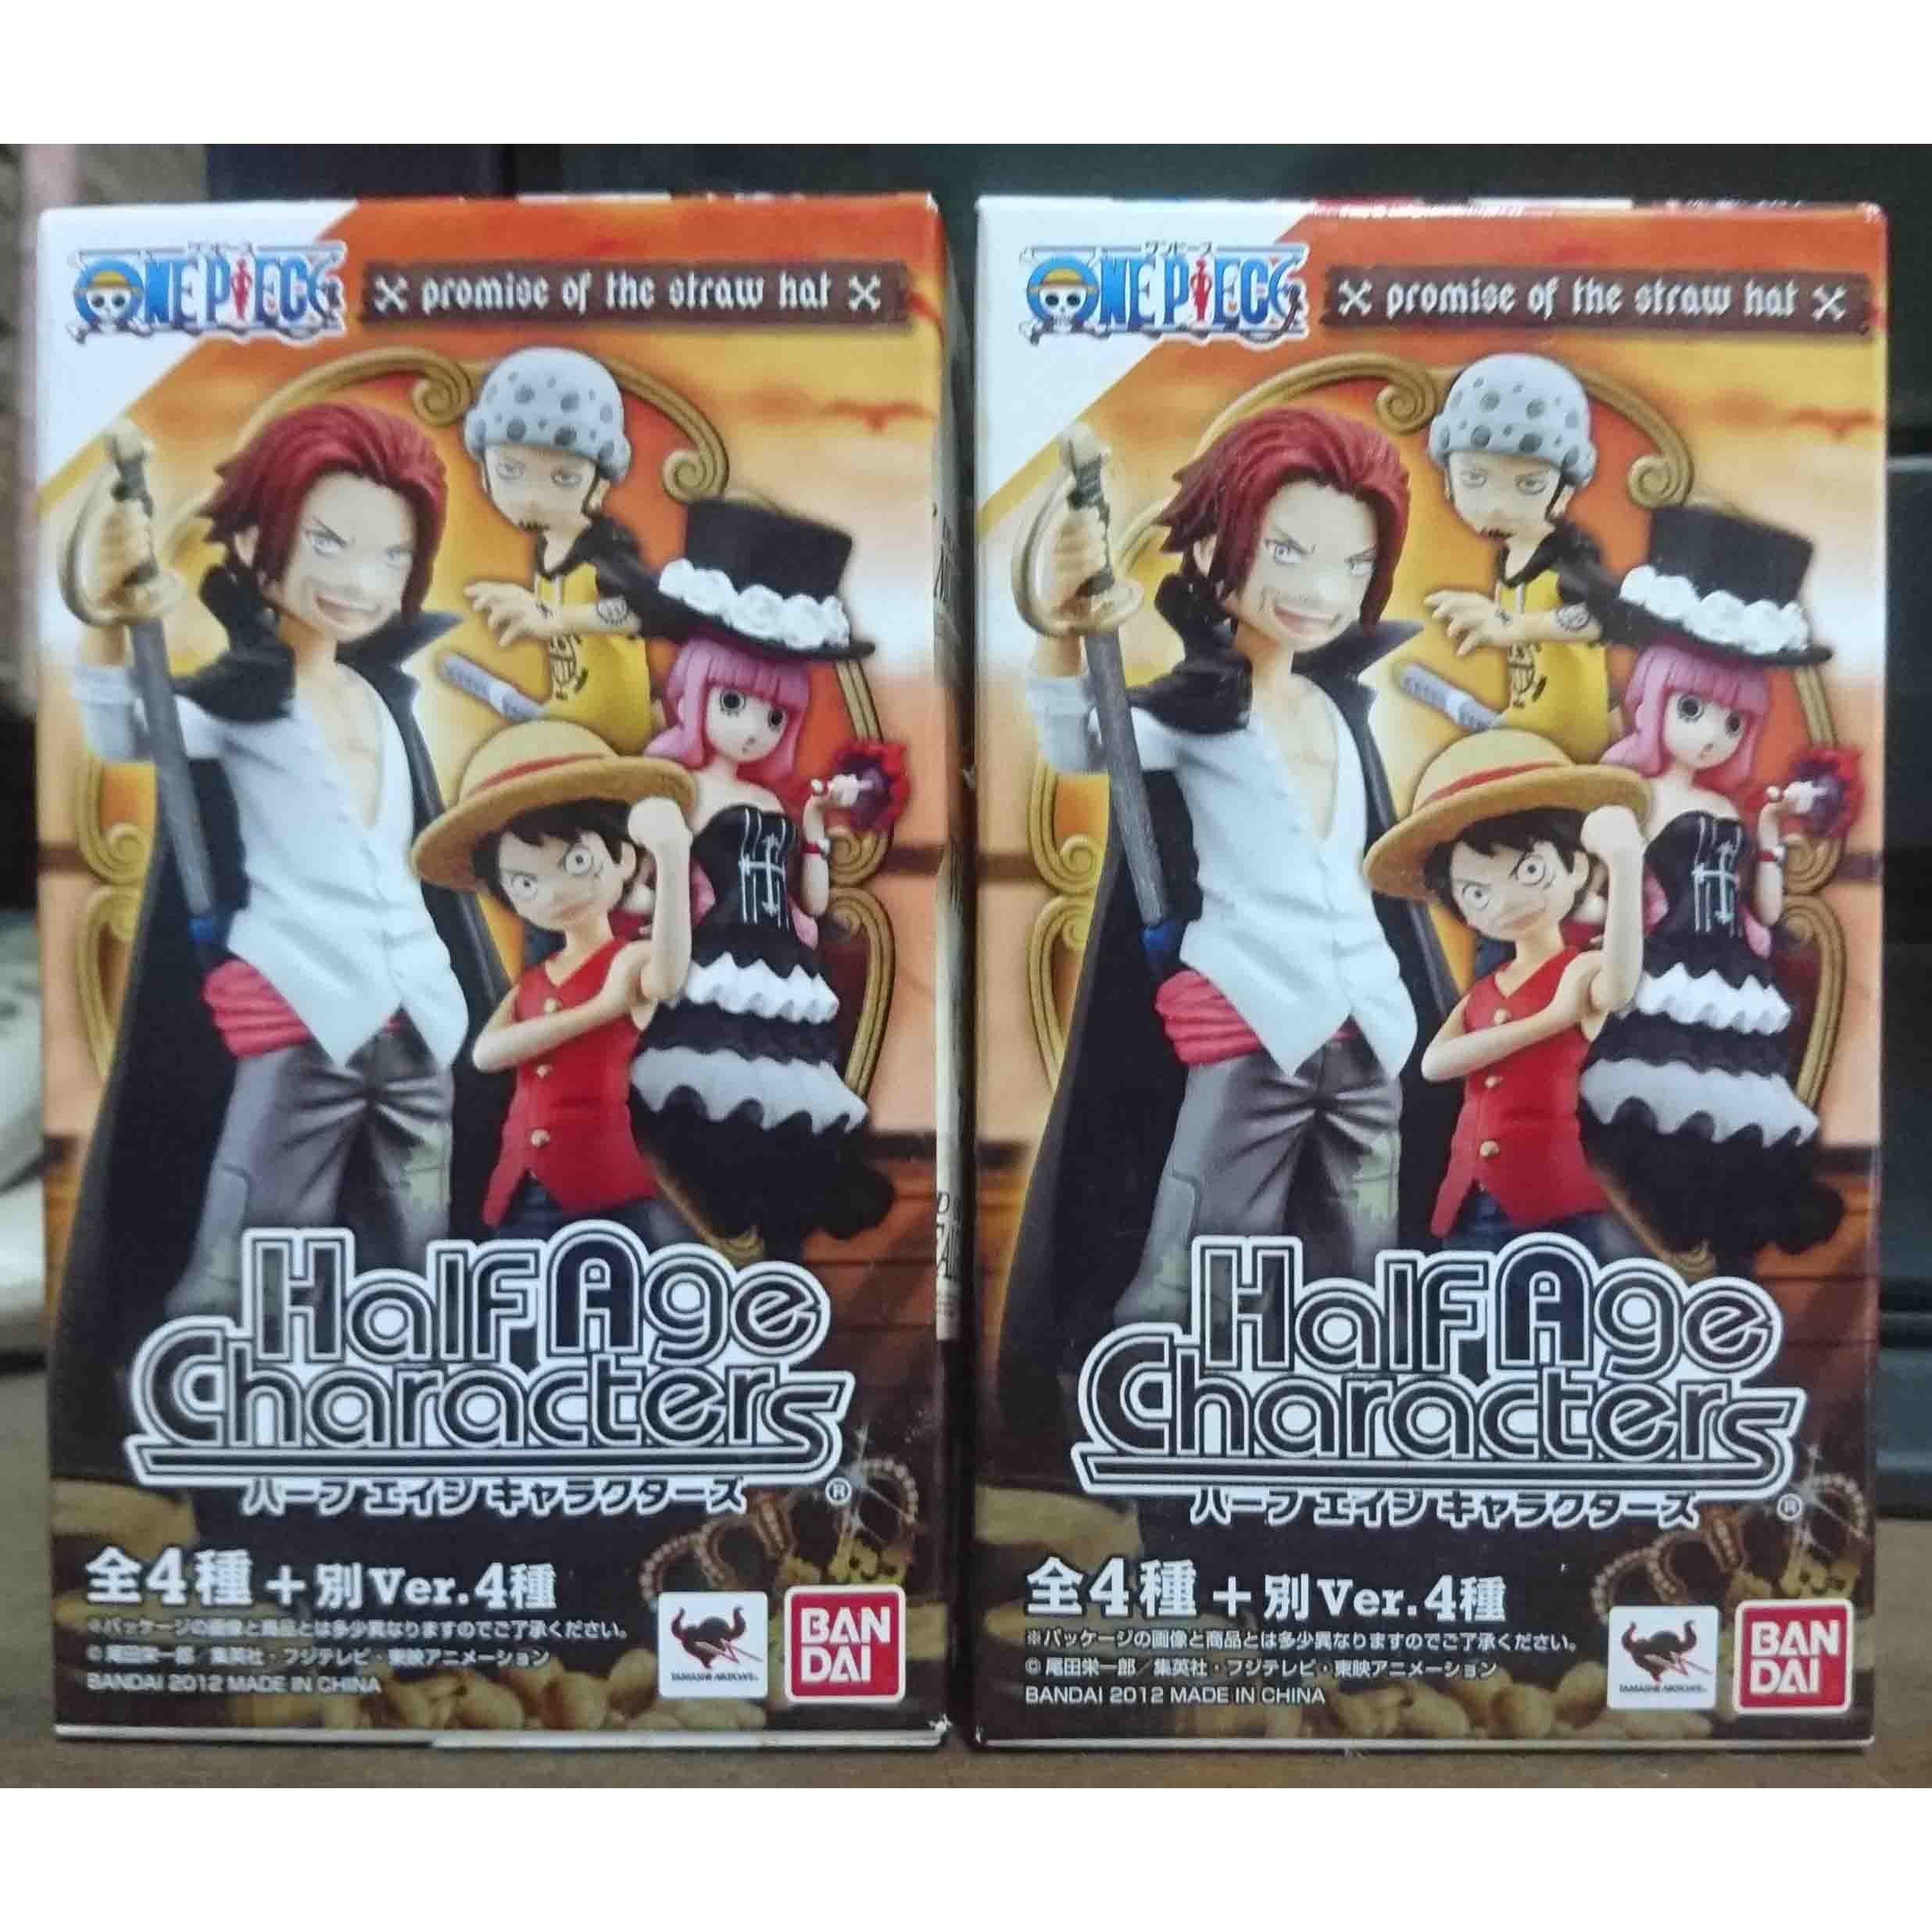 Half 海賊草帽 草帽的約定 第五彈,益祥模型玩具外盒實際拍攝照片。